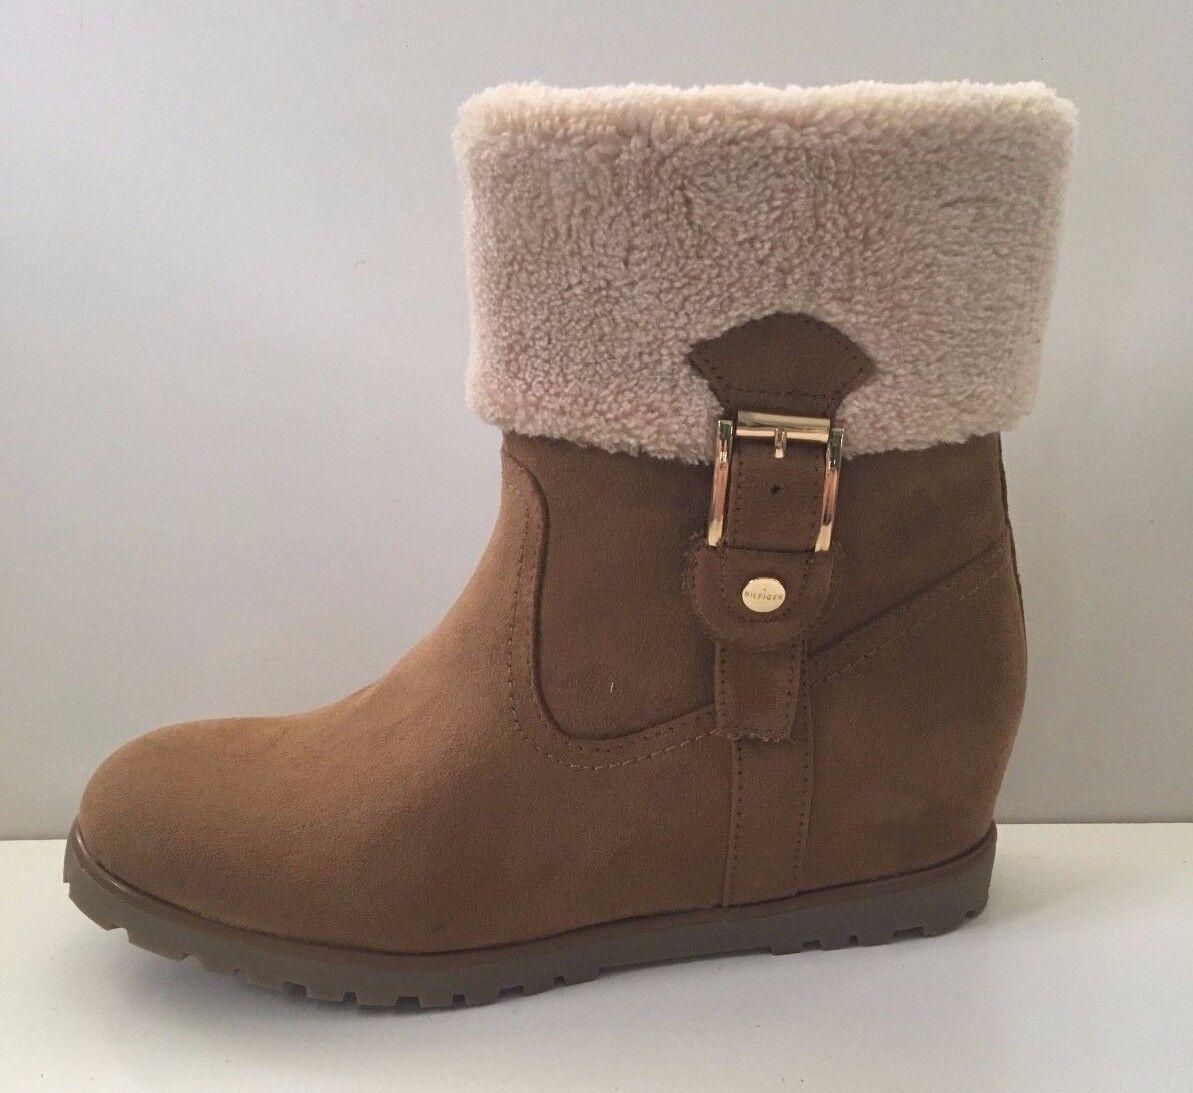 NEW Tommy HilfigerSoffia 2 Women's Wedge Suede Boots Shoes Sz 7.5M